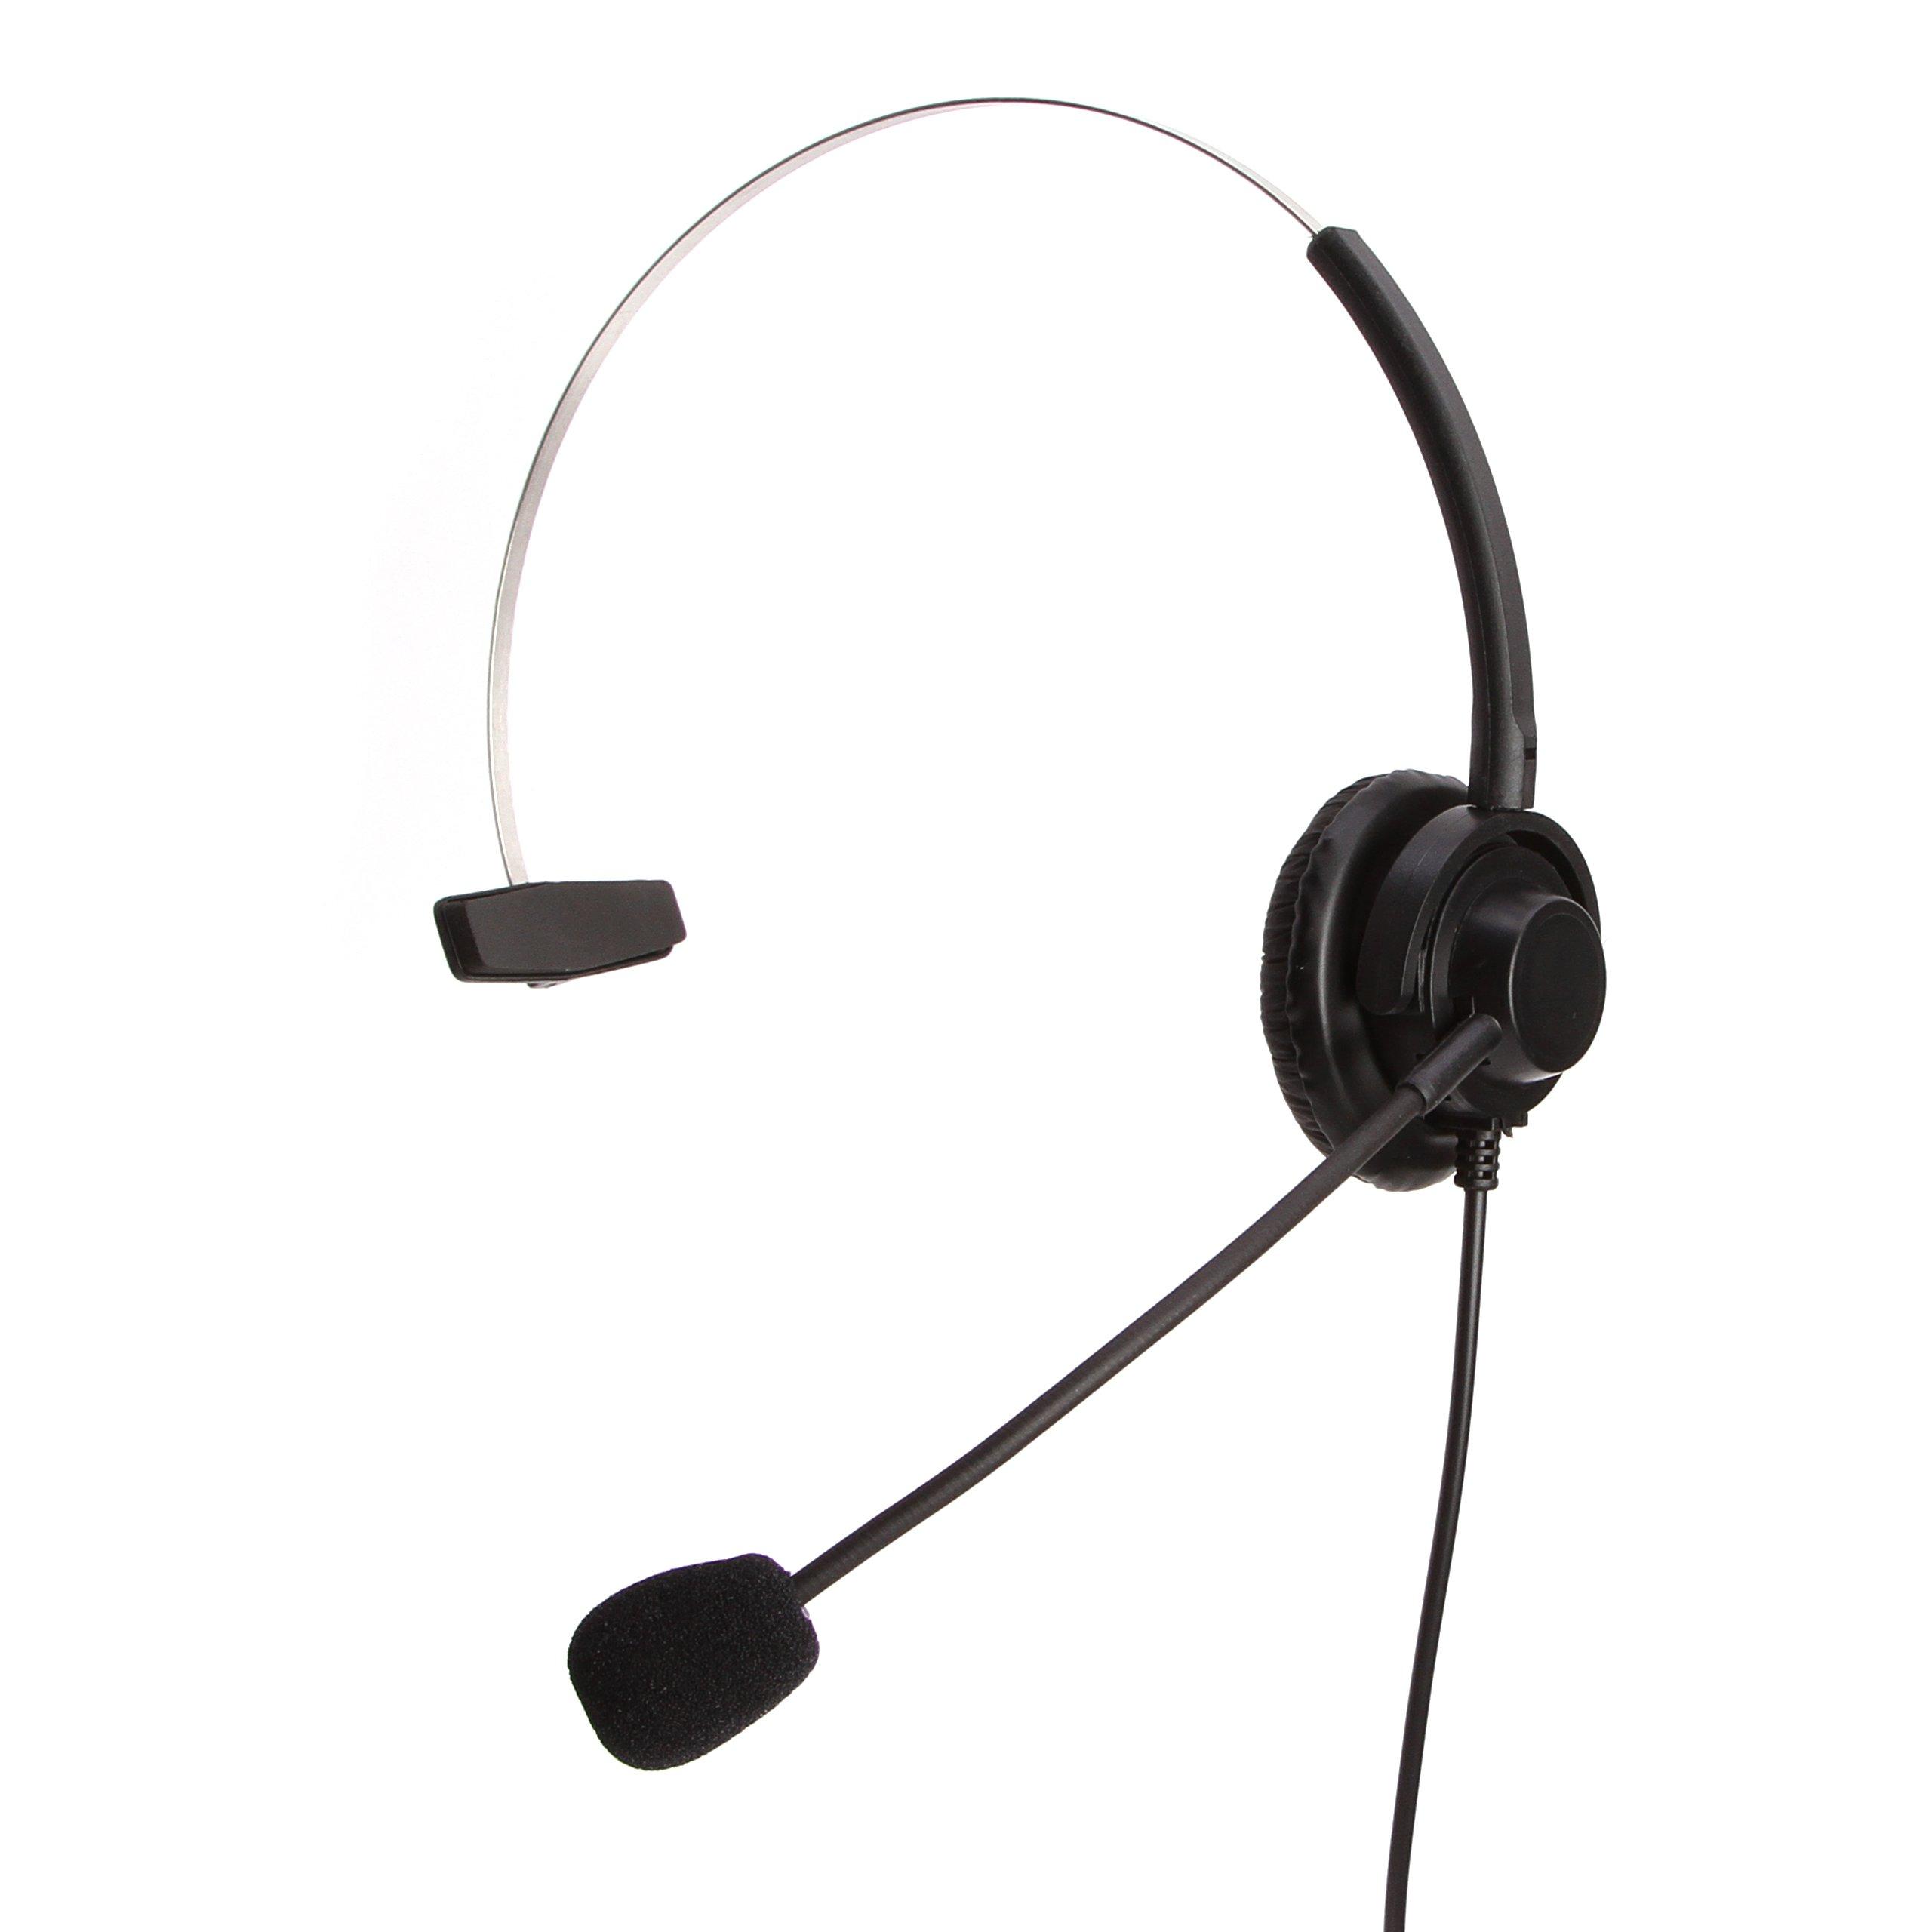 Headset Headphones Volume+Mute Control+Standard 2.5mm Plug Jack Cisco Spa Series Spa303 Spa504g Other, Polycom Soundpoint Ip 320 330, Grandstream, Linksys, Panasonic, Cortelco